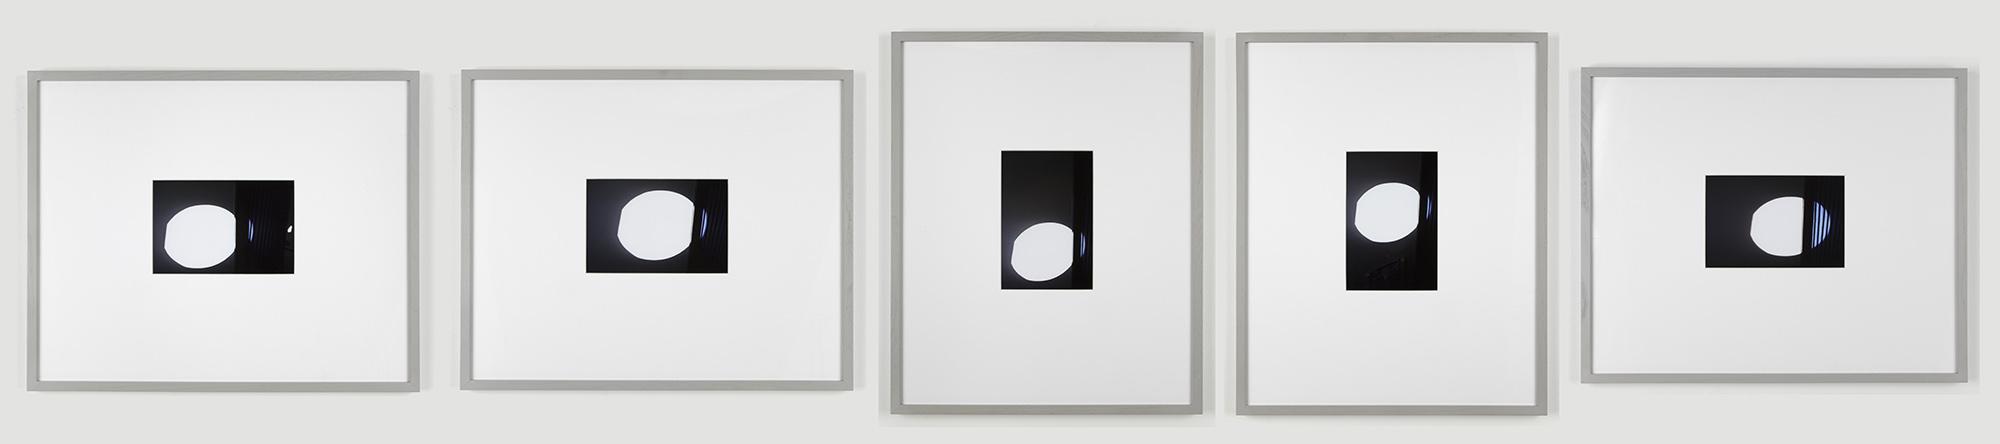 Martin BOYCE Projectile Sun 2013 Giclee prints set...